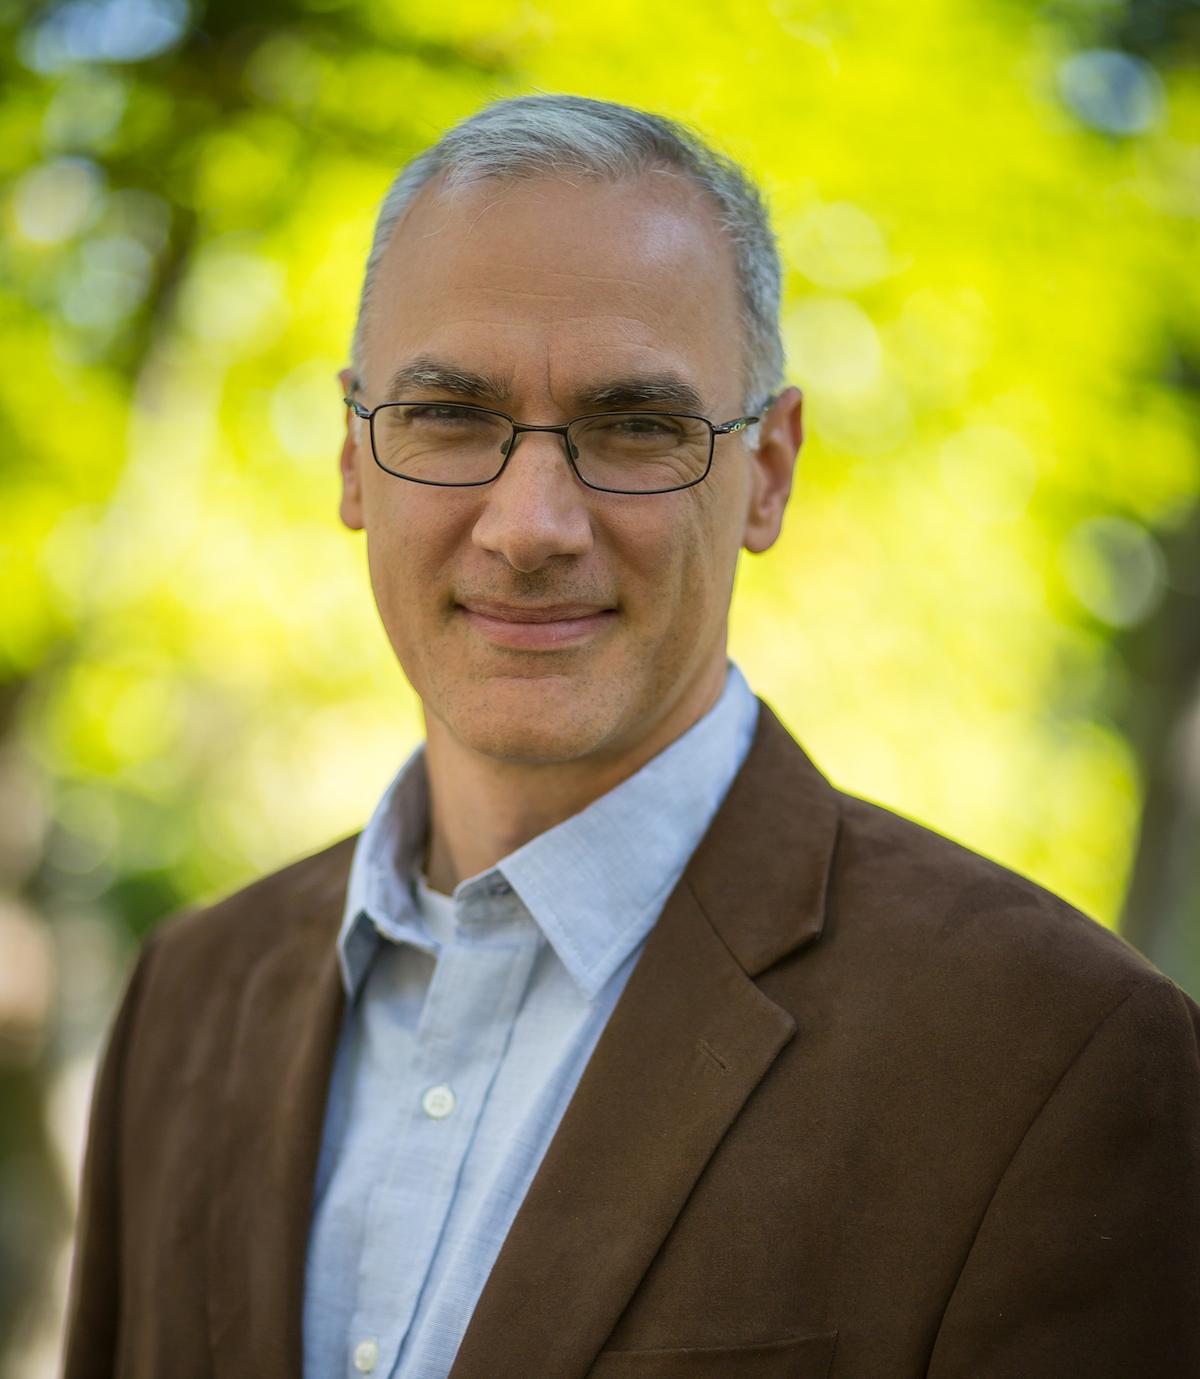 Dr. Marc Tomljanovich, Professor of Economics and Business, at Drew